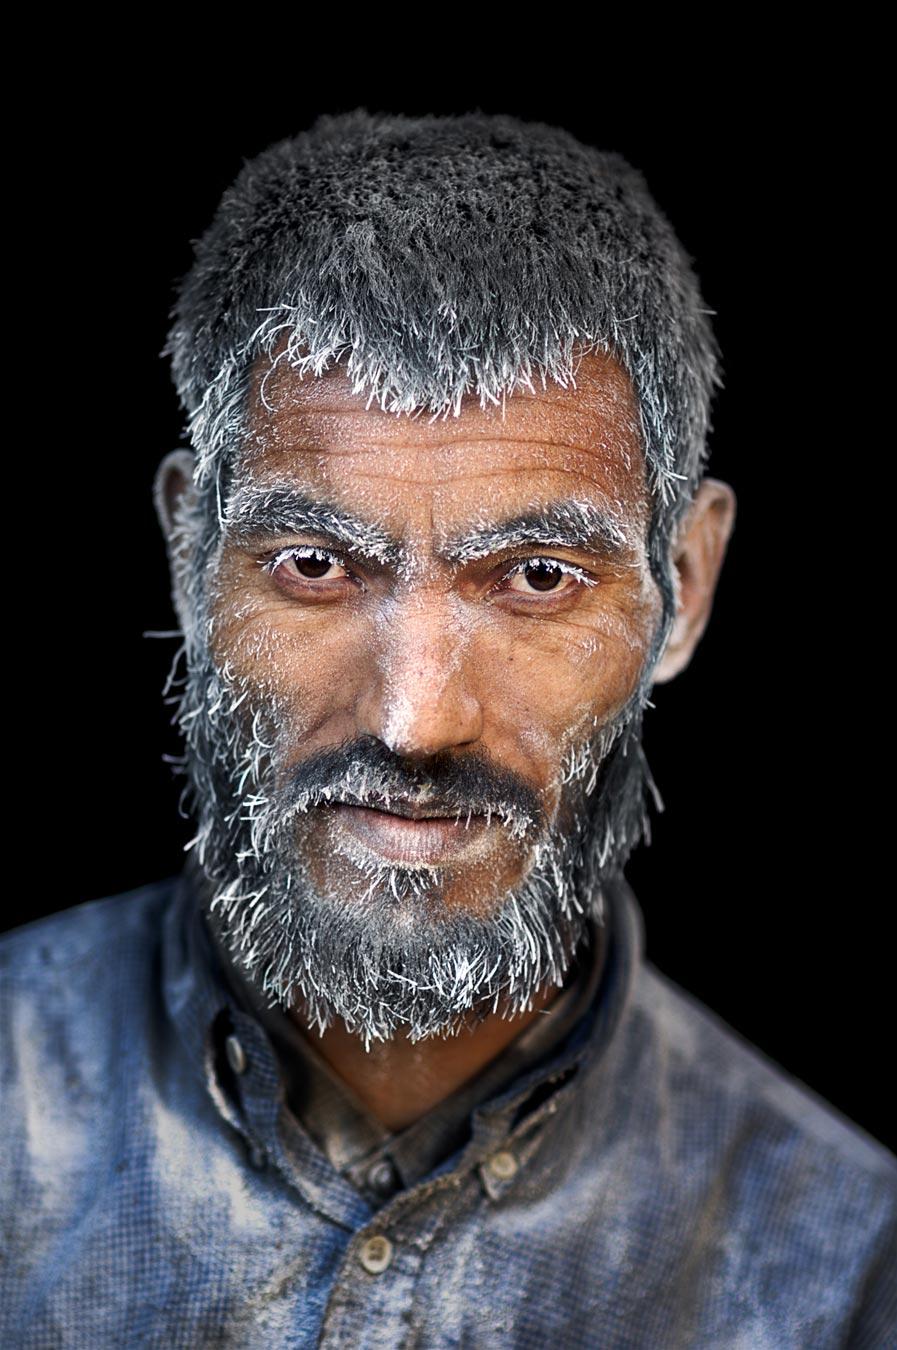 Vanessa Shepherd Photography Journal: Steve McCurry ...